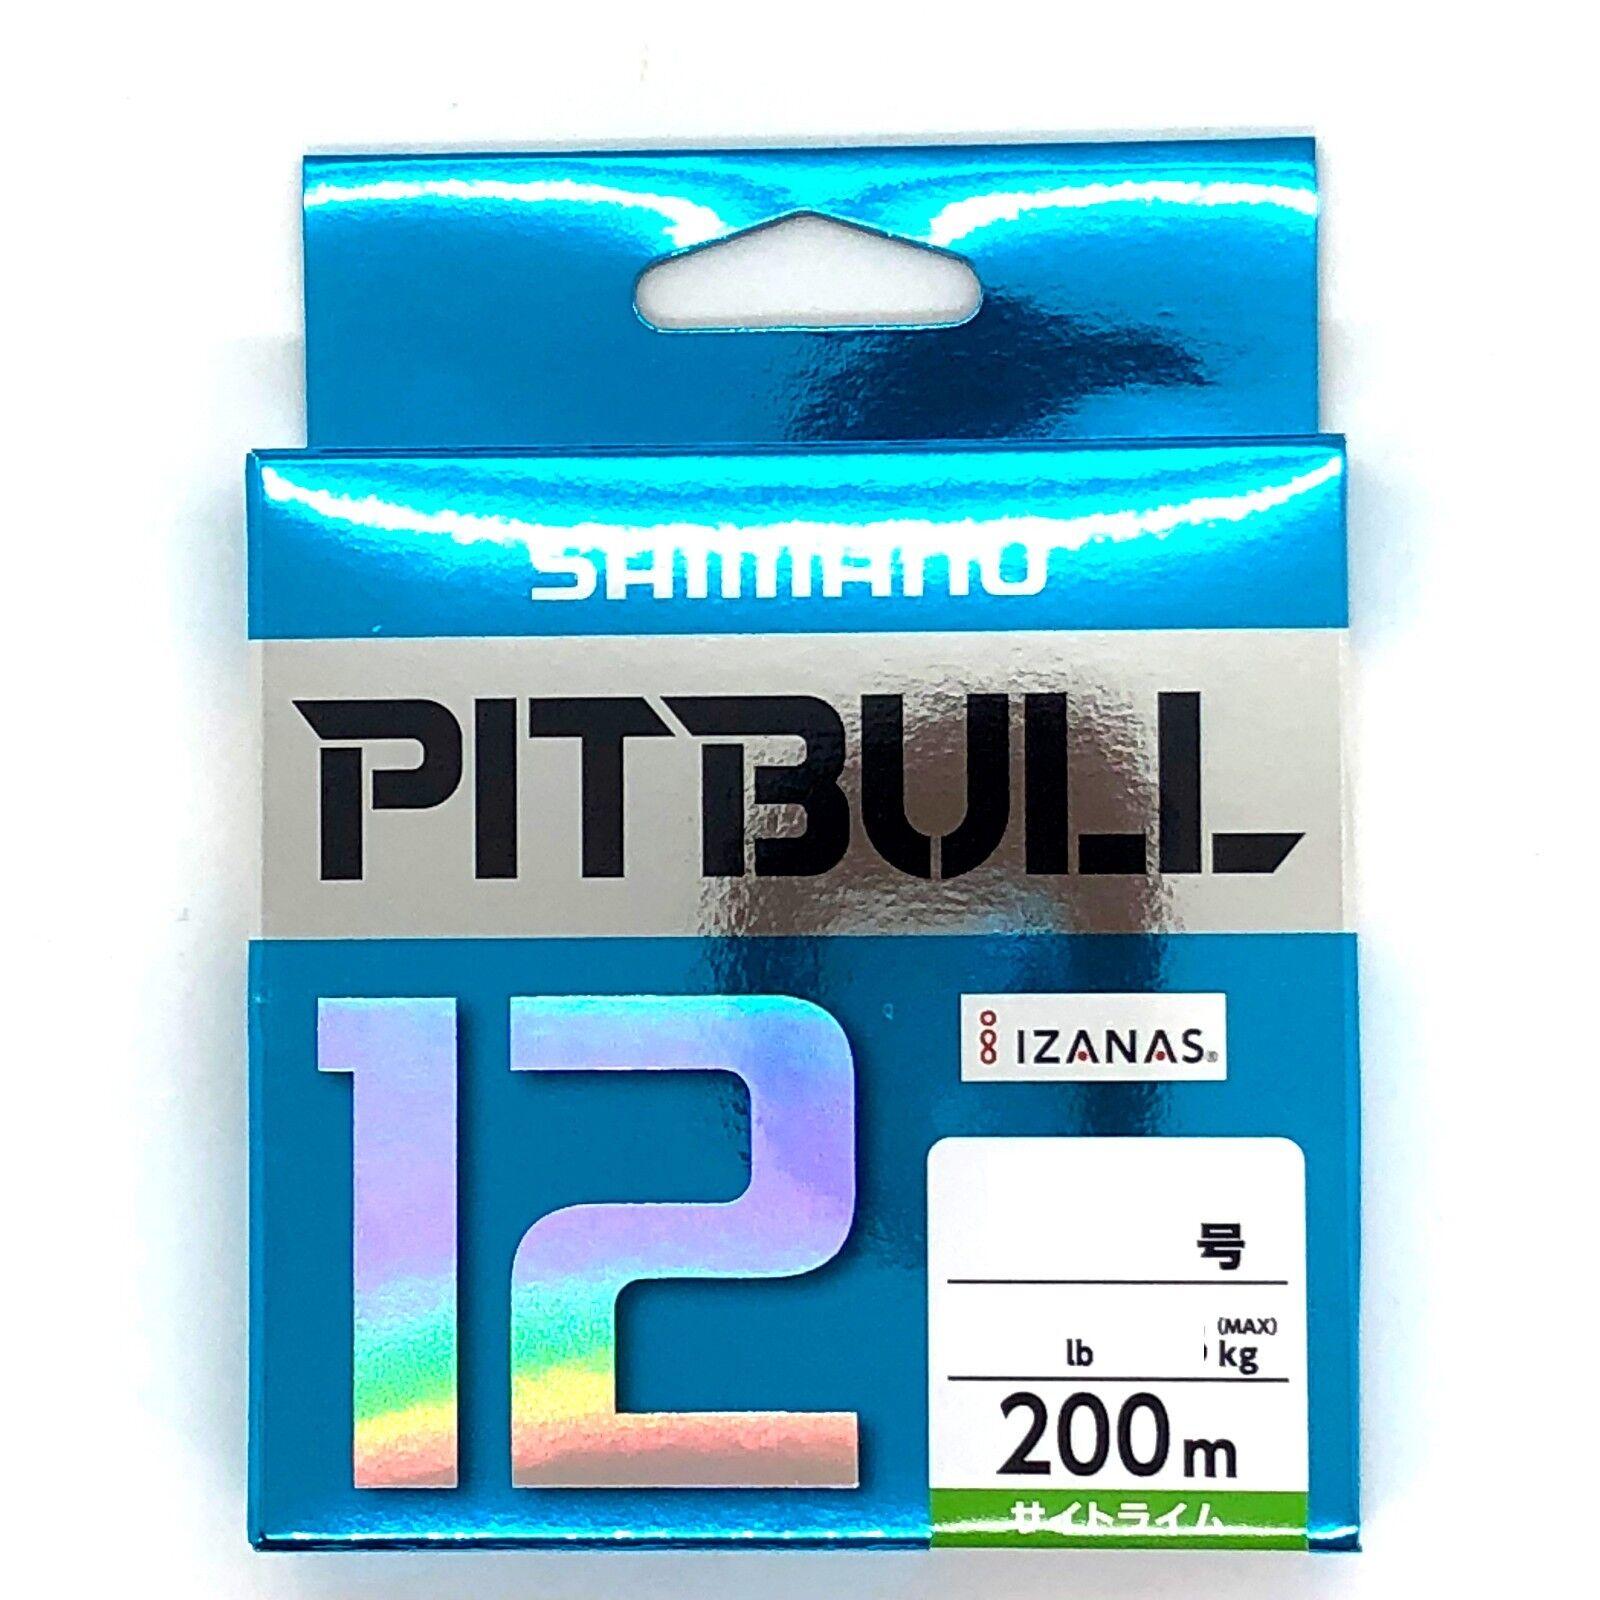 SHIMANO PITBULL X12 Braided Line PE 200m Lime Grün Select LB Free Shipping